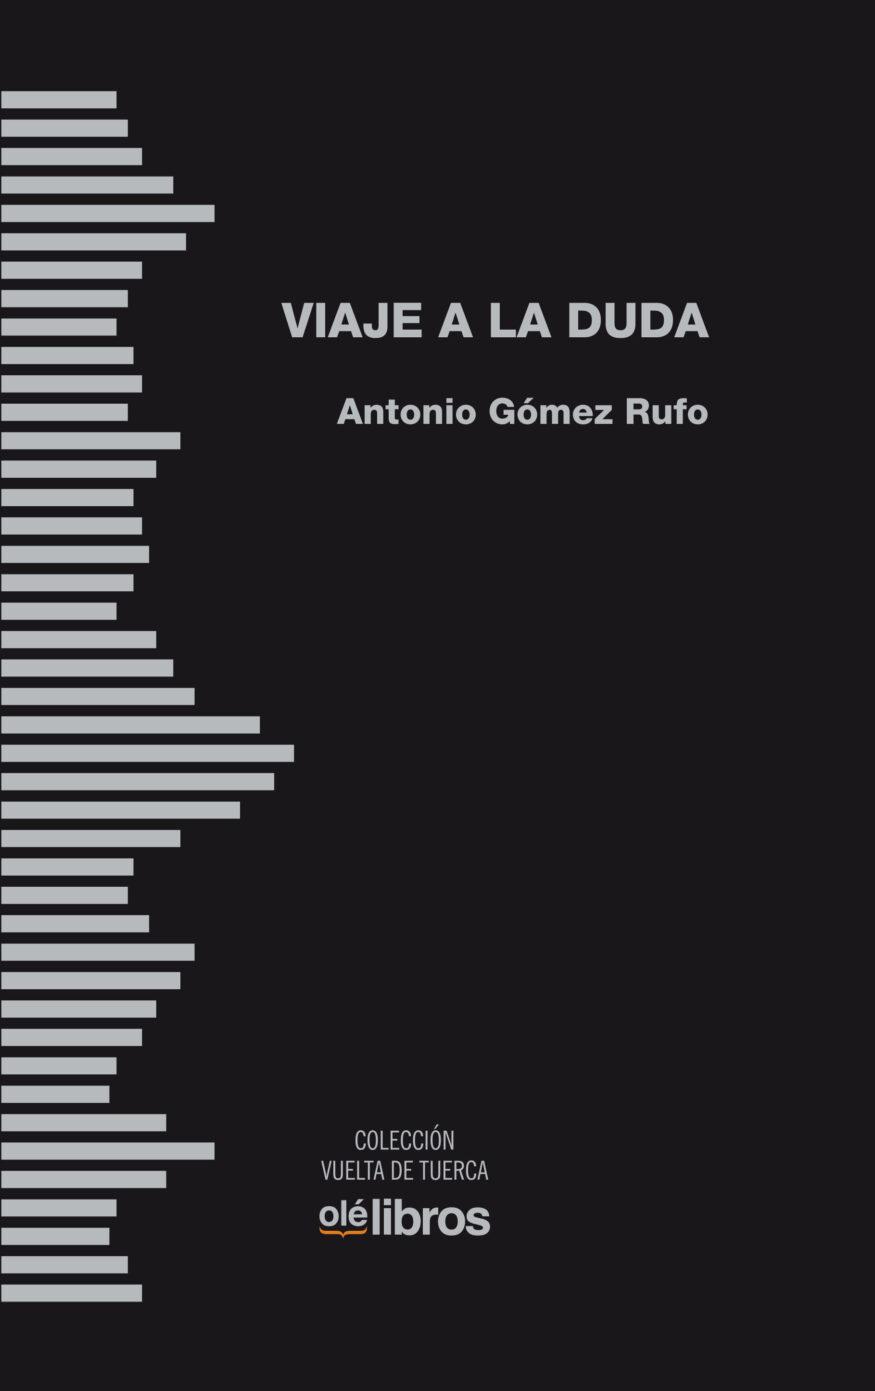 antonio_gomez_rufo_viaje_duda_ole_libros